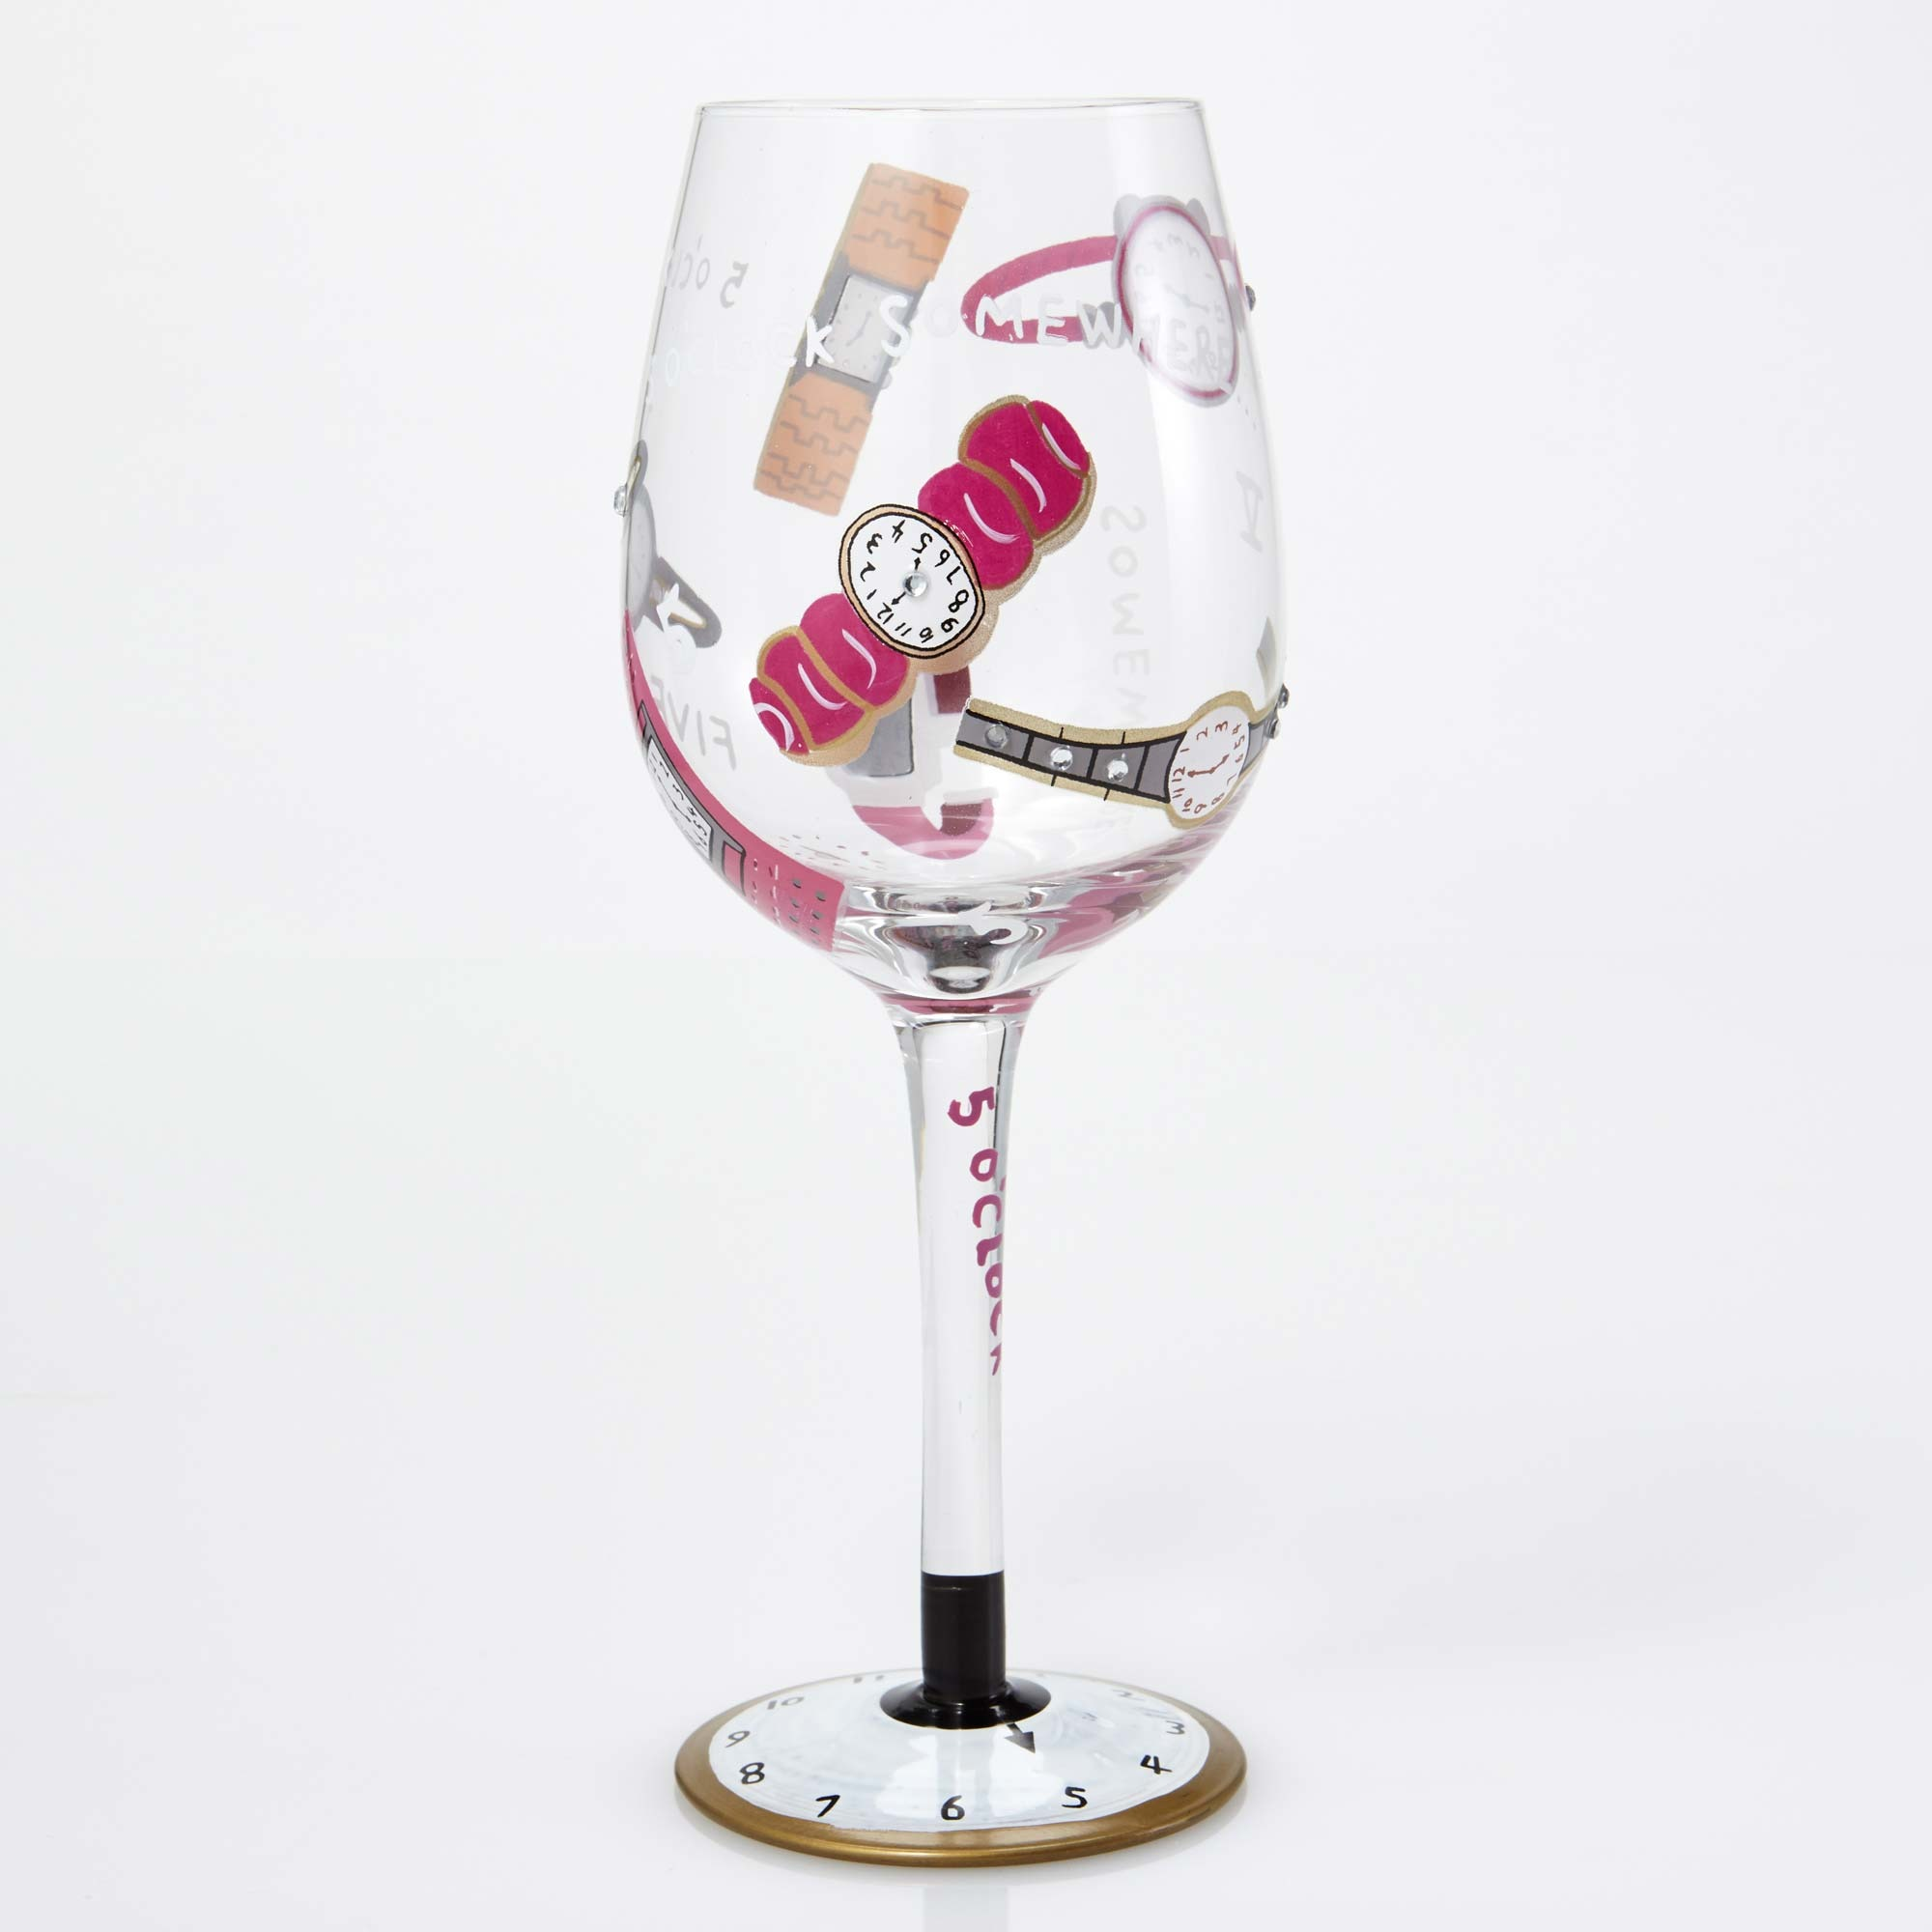 5 O' Clock somewhere - Wine Glass